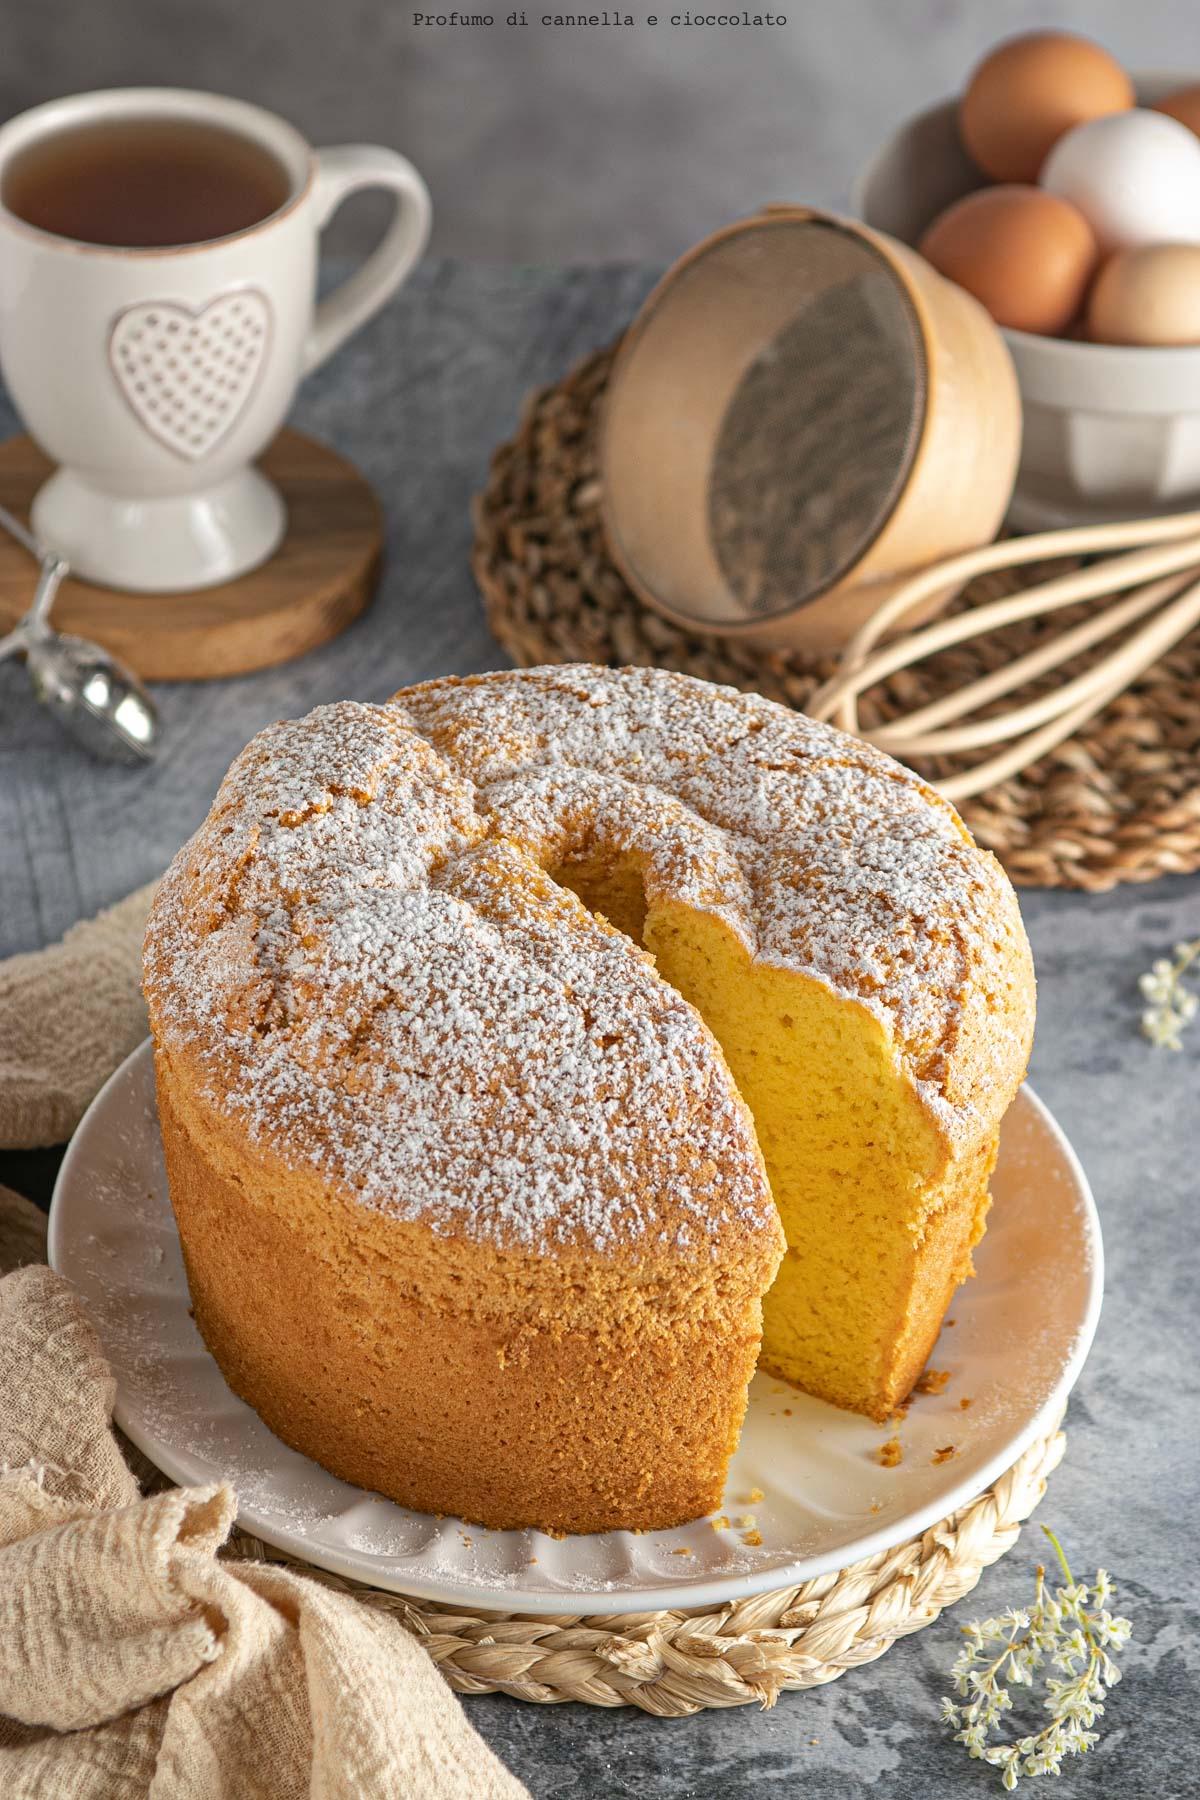 Chiffon cake classica